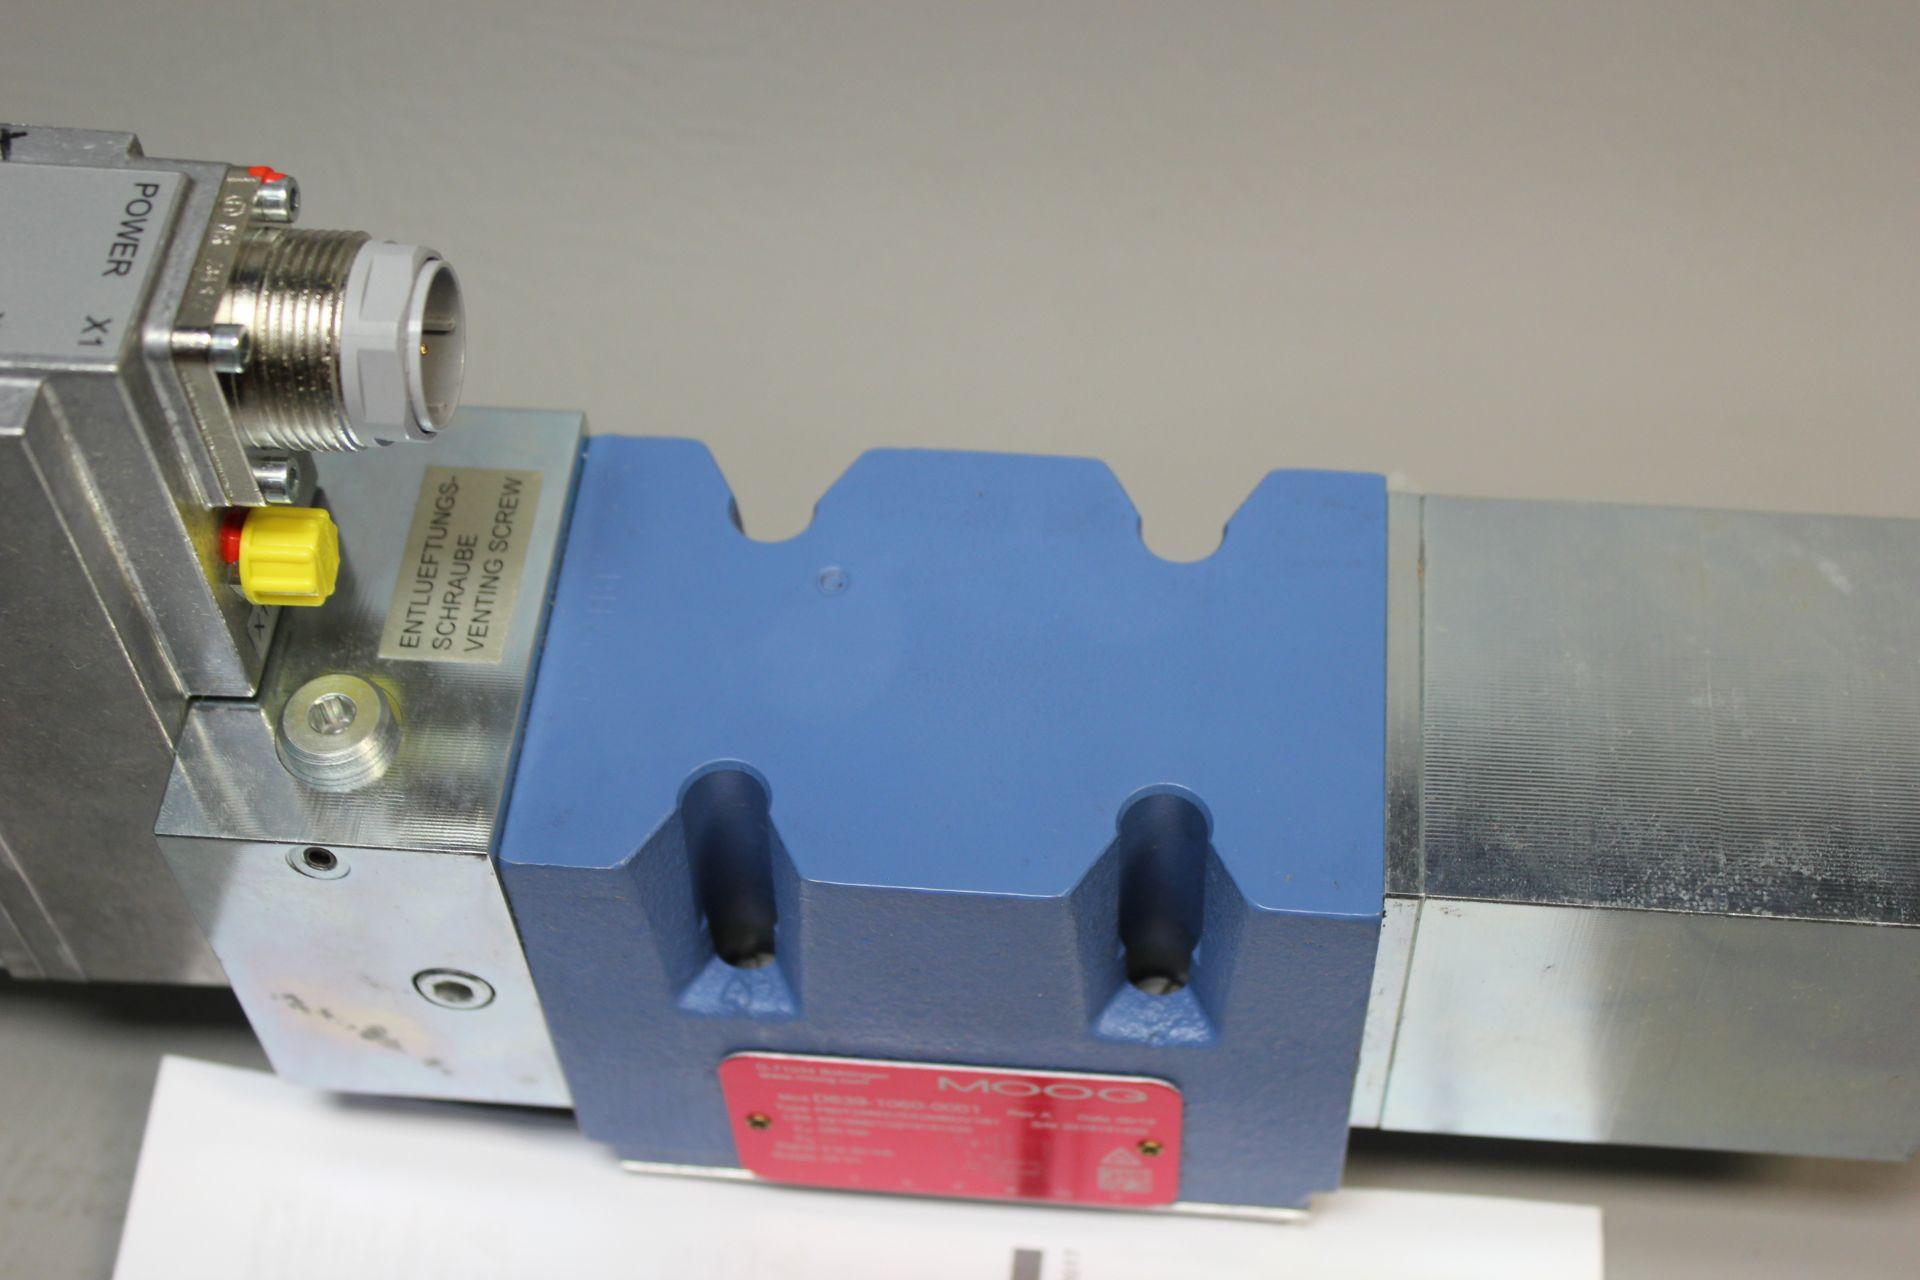 NEW MOOG DIRECT DRIVE DIGITAL CONTROL HYDRAULIC SERVO VALVE - Image 7 of 14